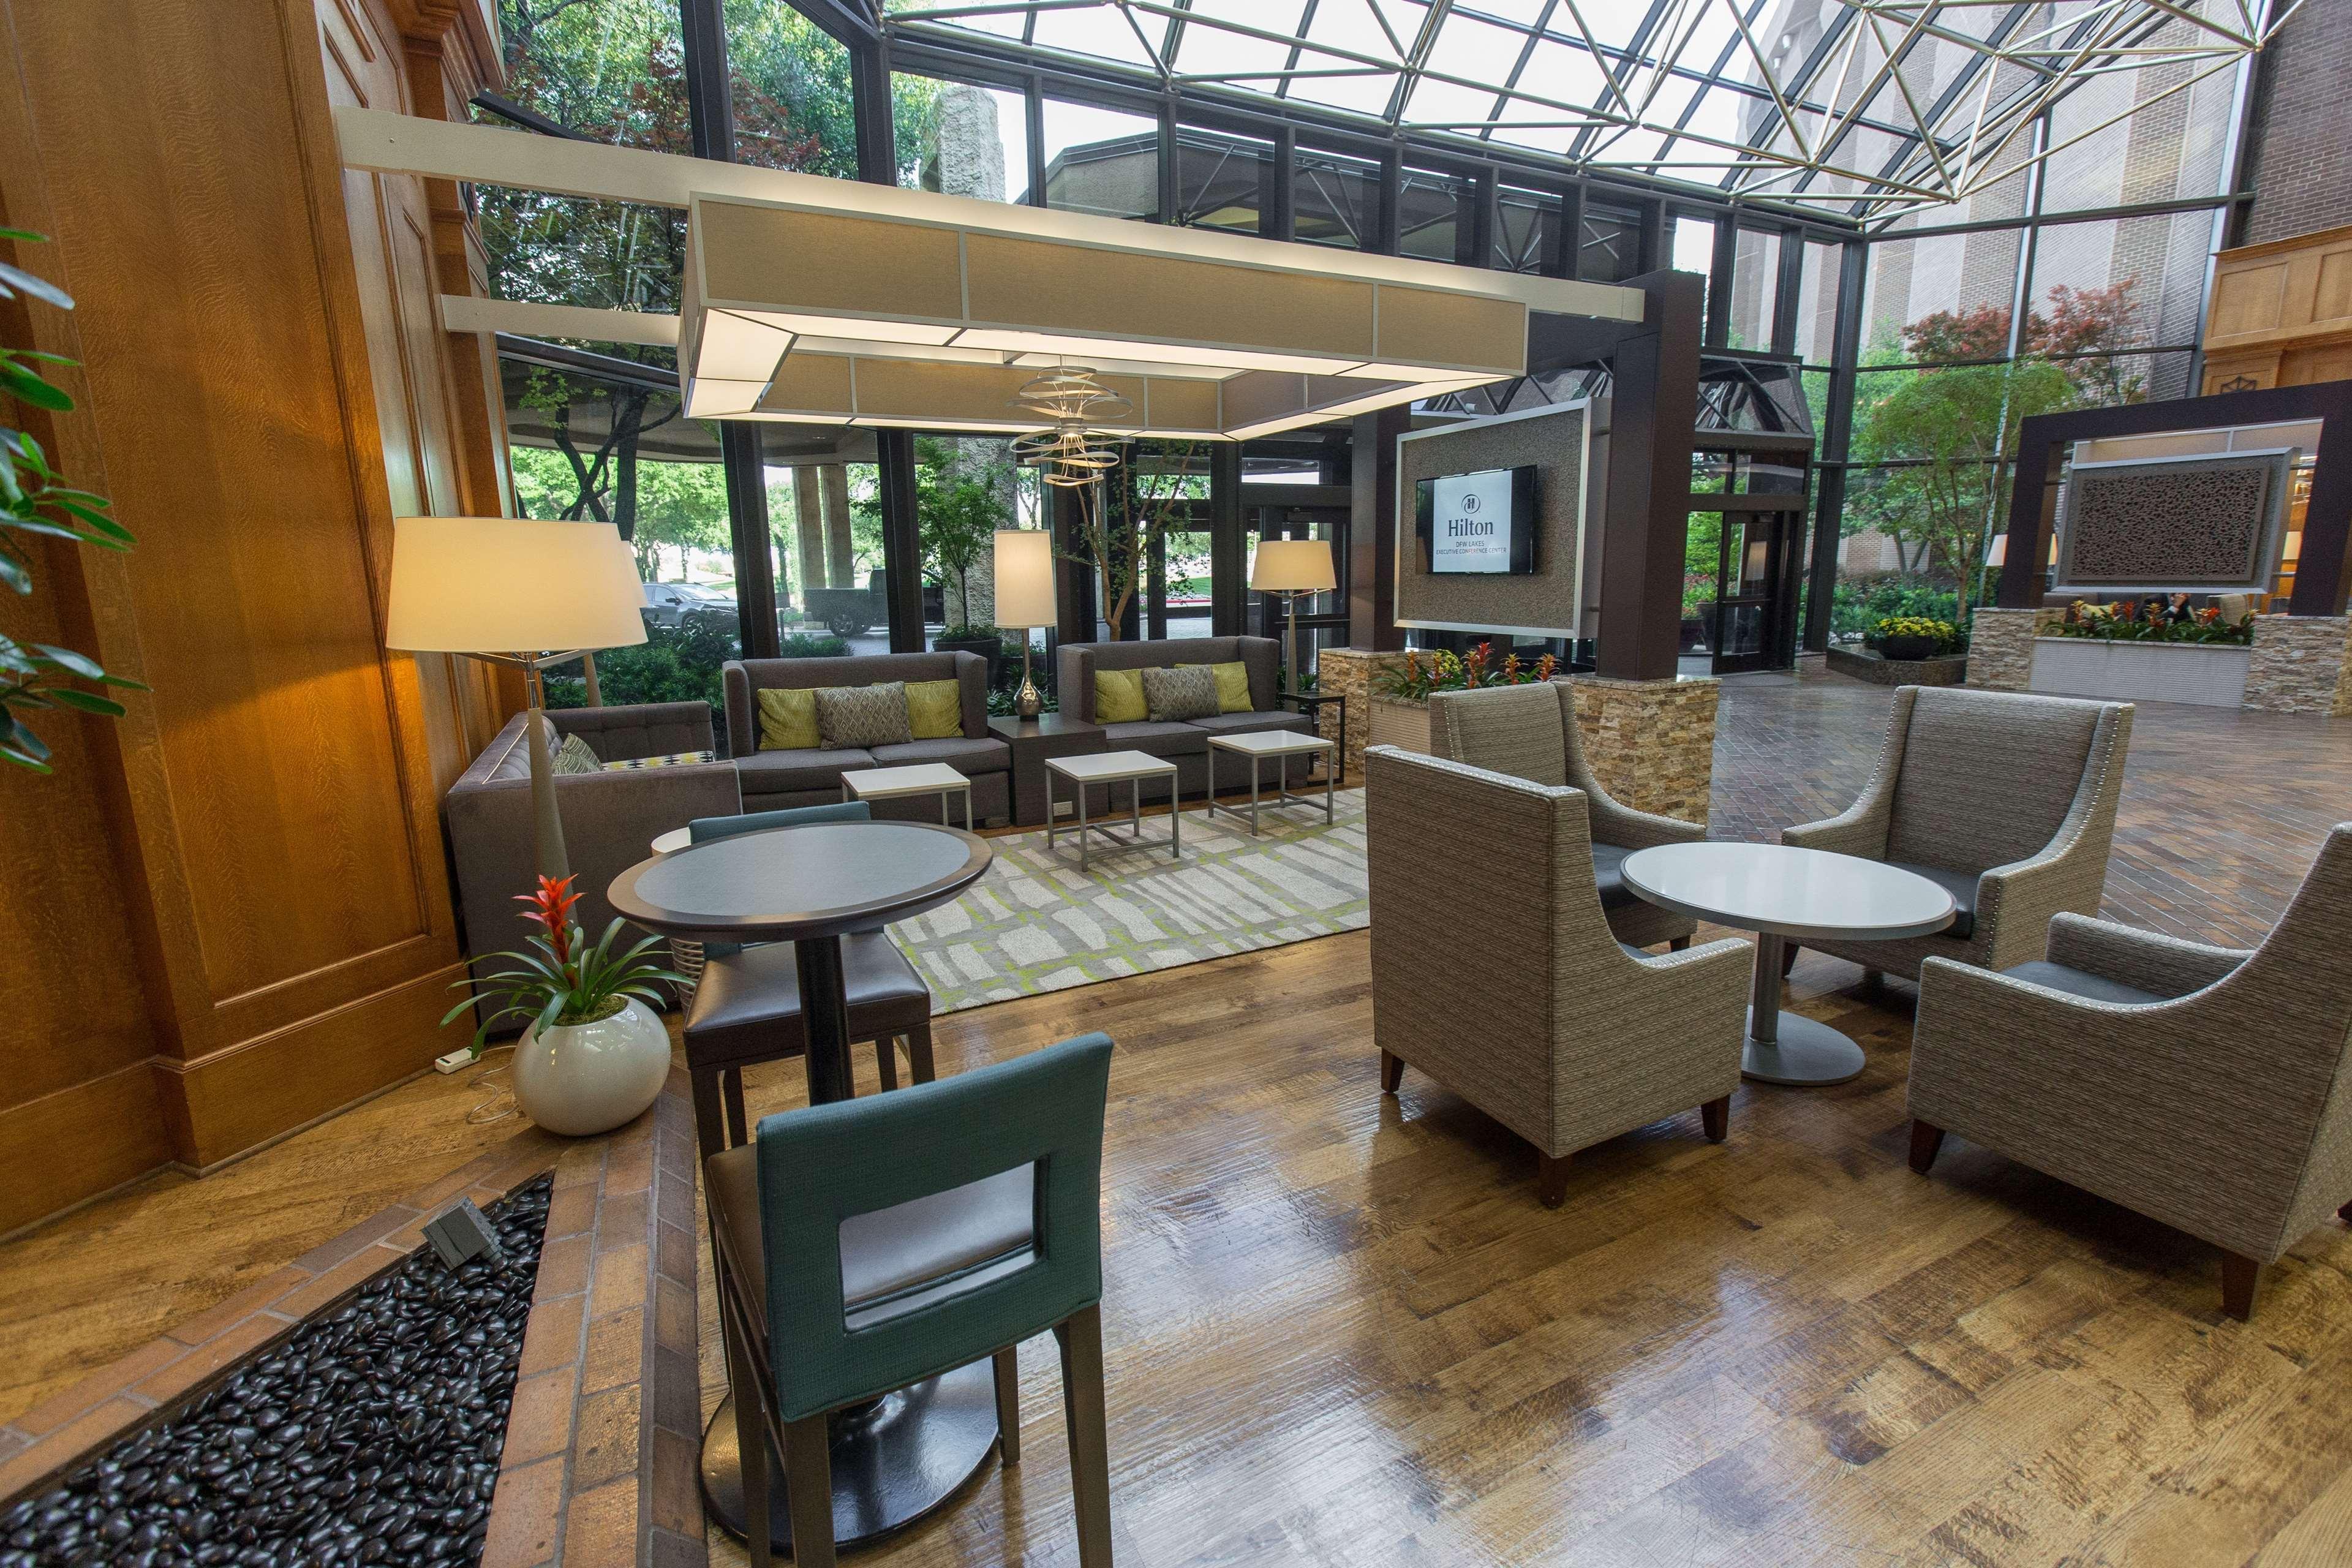 Hilton DFW Lakes Executive Conference Center image 5